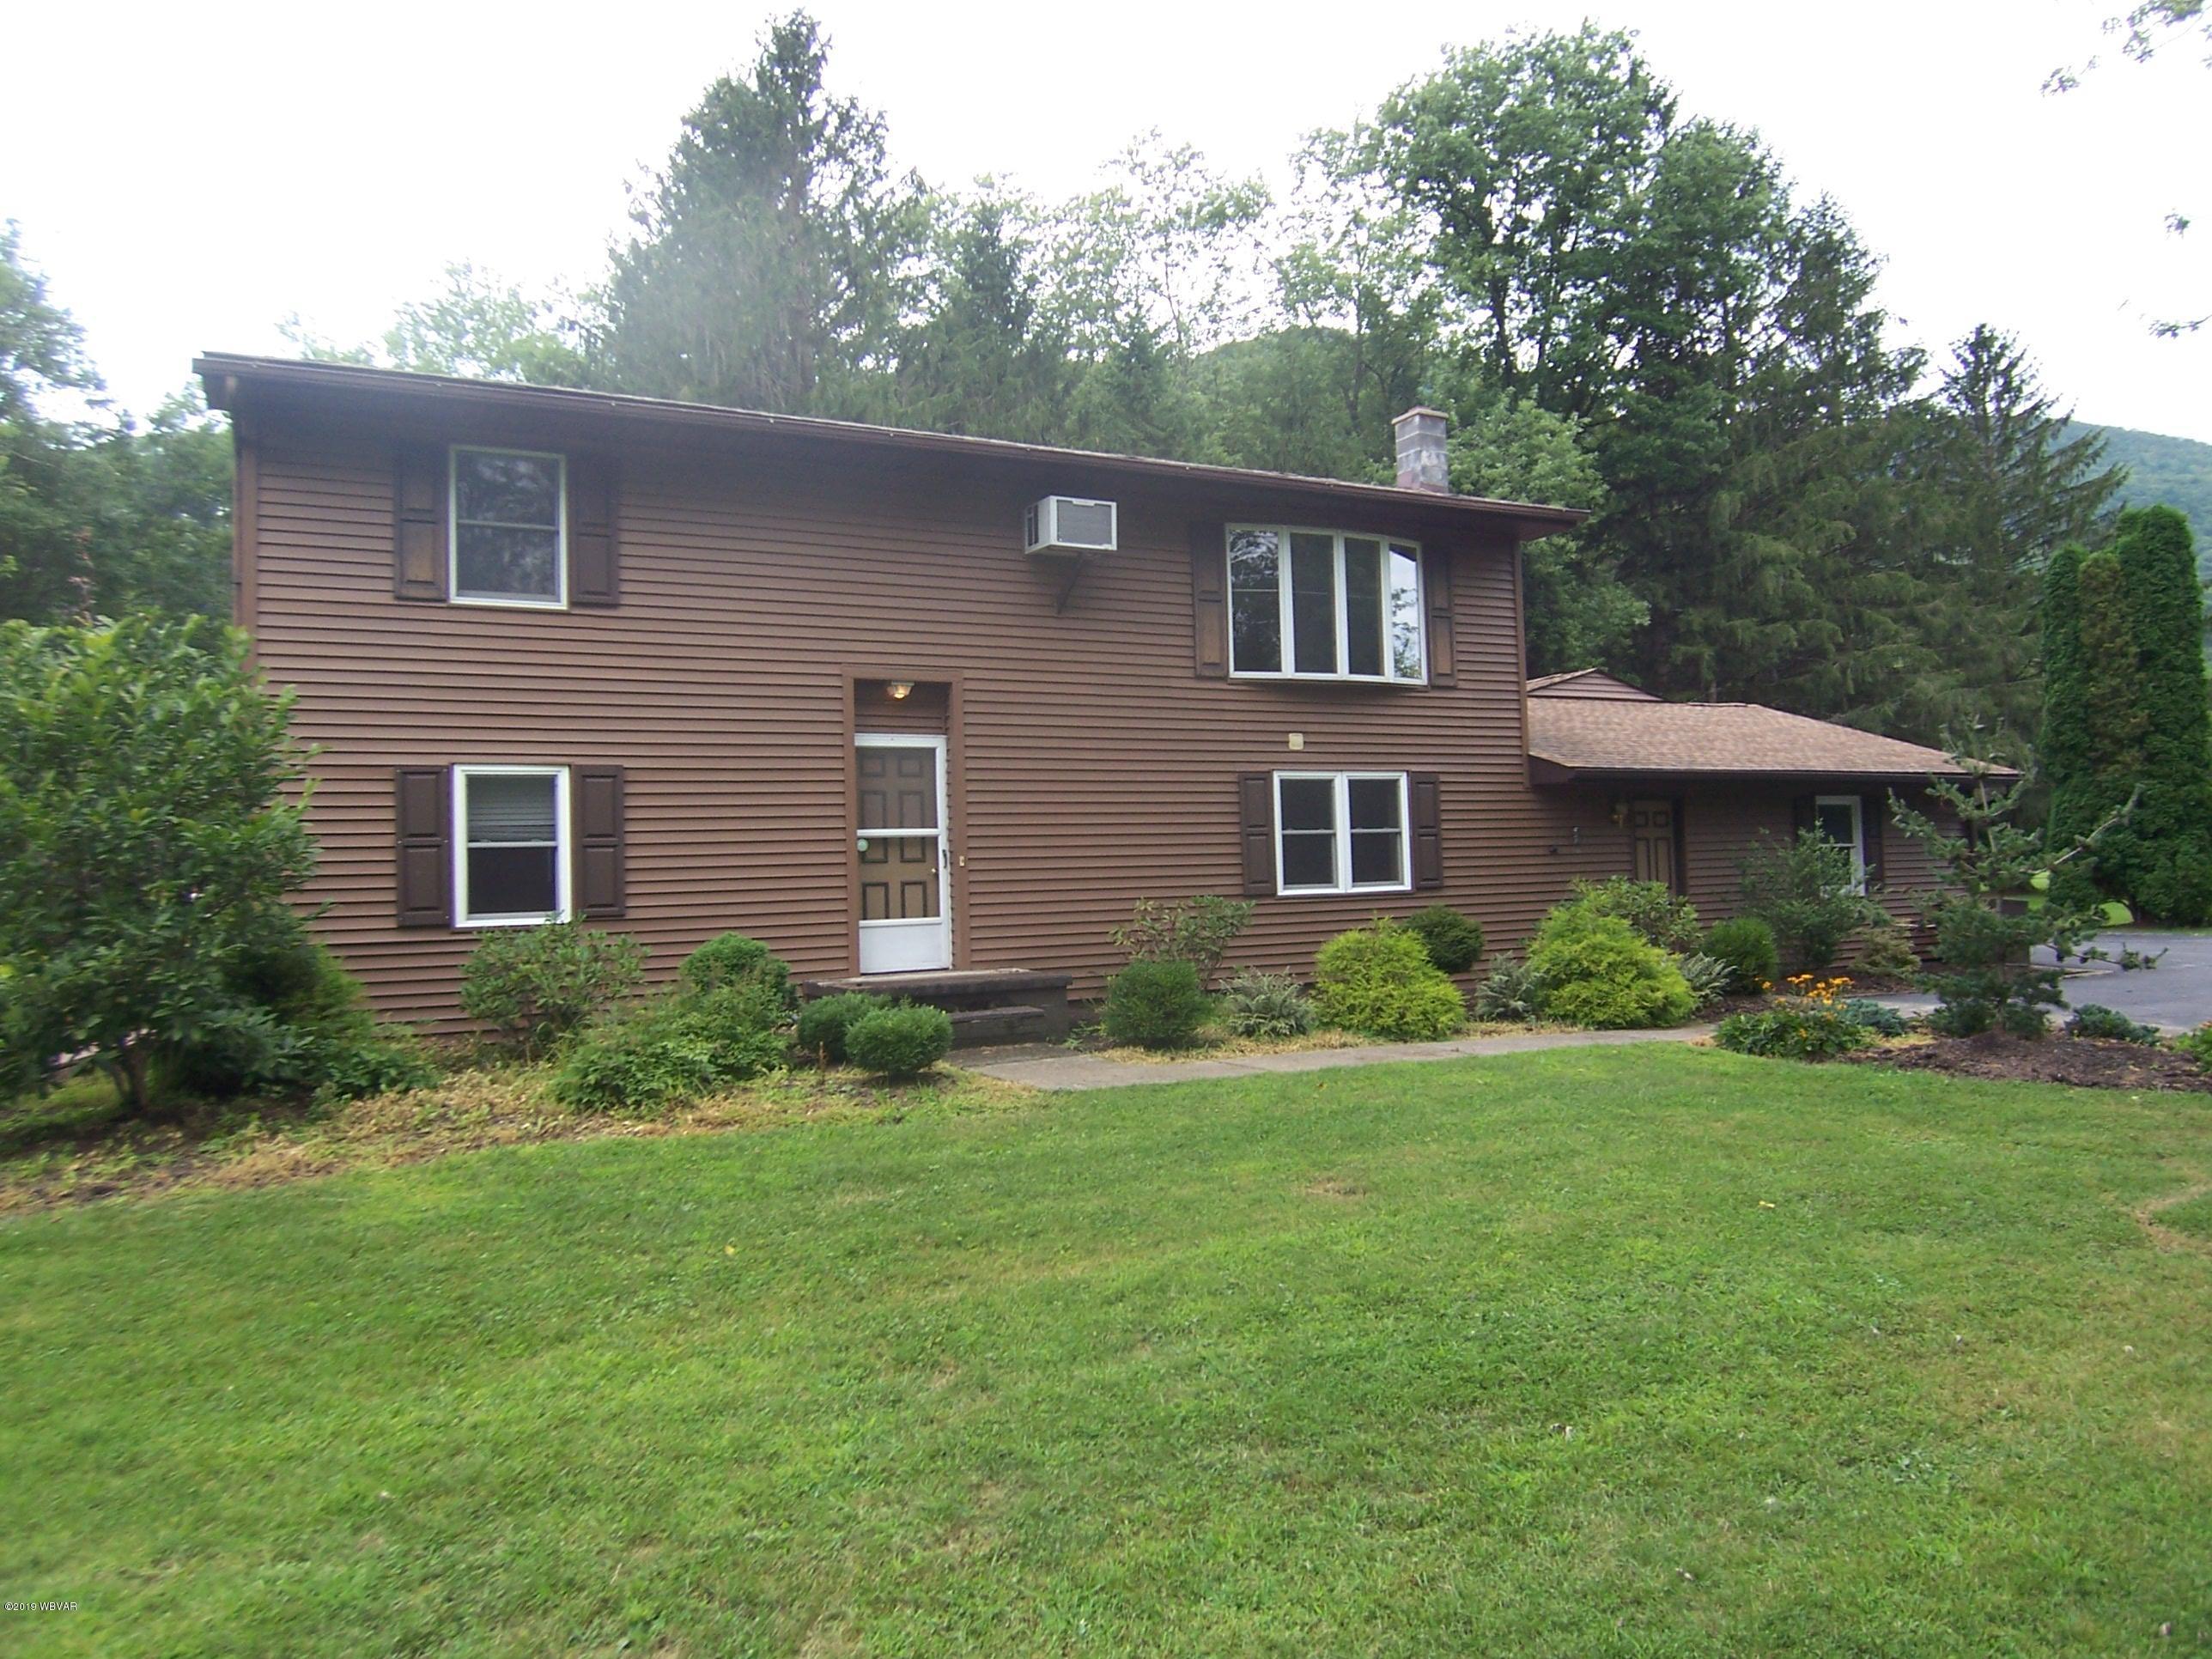 33 PINE LANE,Jersey Shore,PA 17740,3 Bedrooms Bedrooms,2 BathroomsBathrooms,Residential,PINE,WB-88213